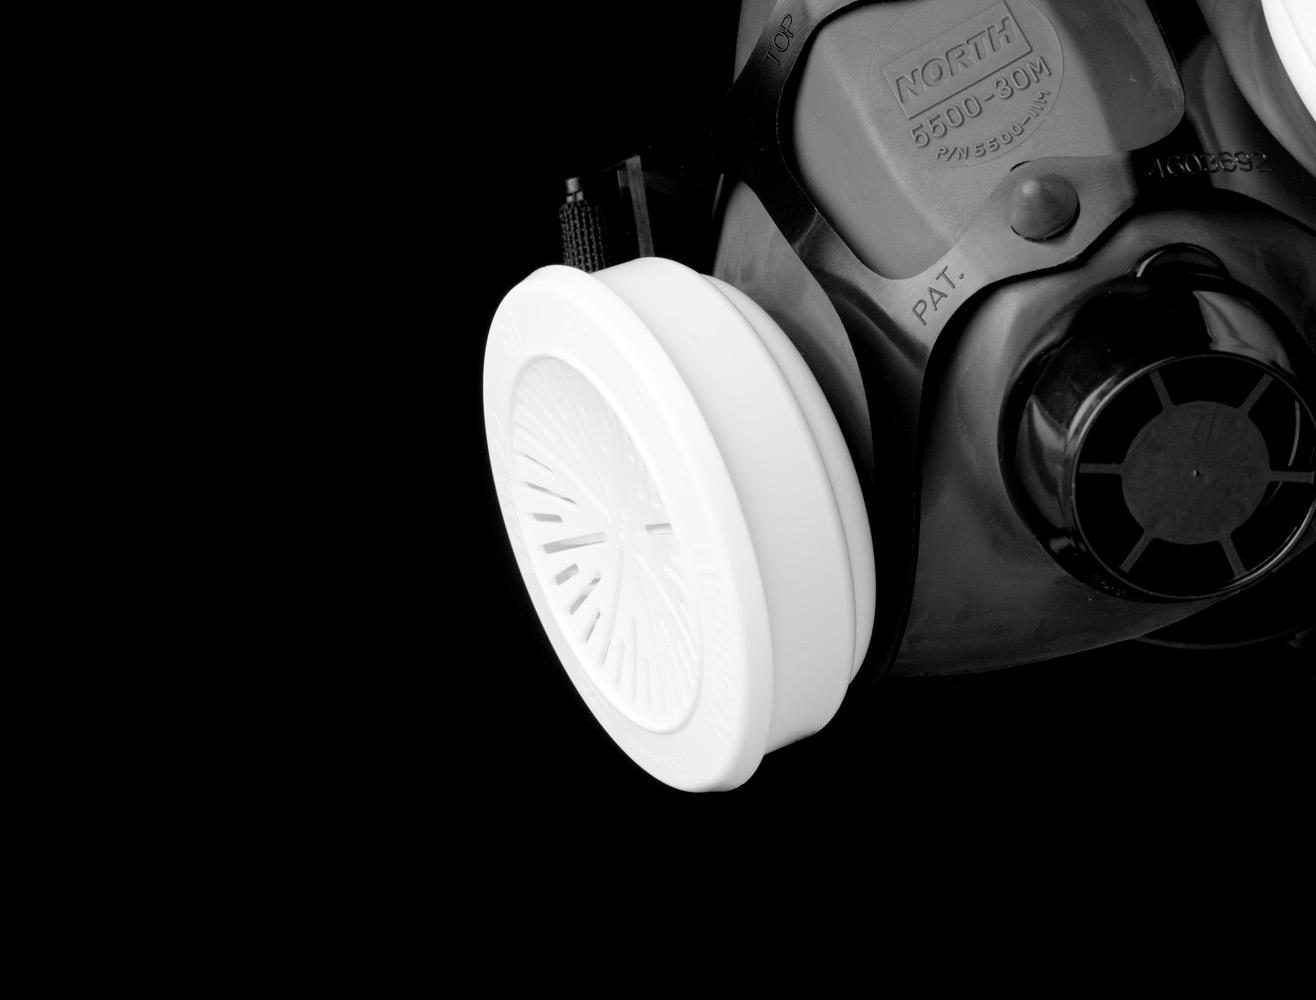 North 5500 - 30M half gelaatsmasker